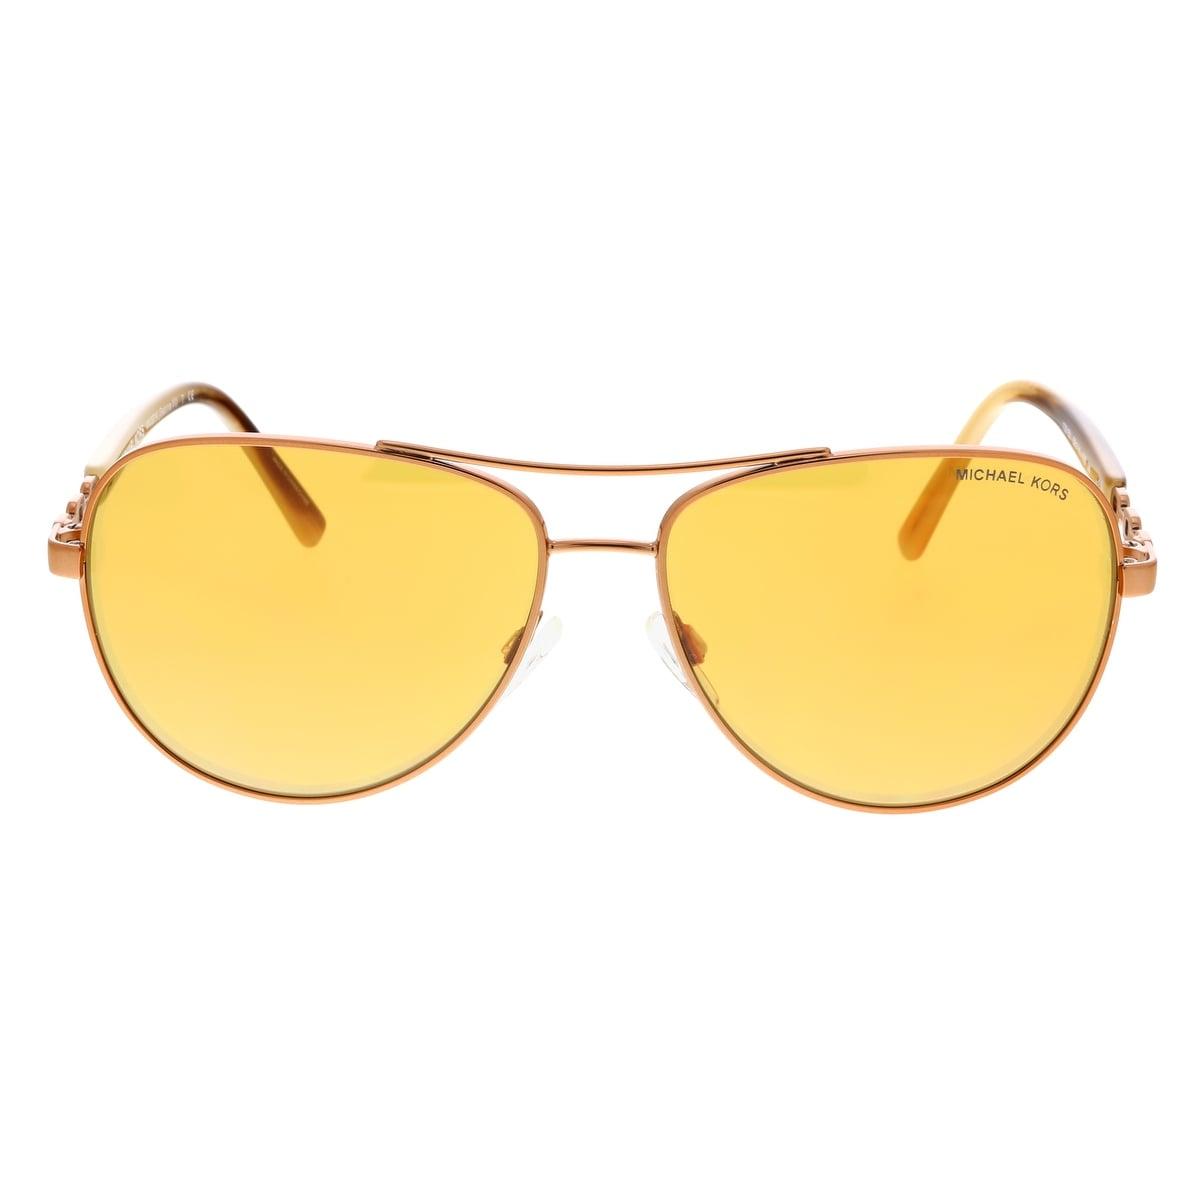 13f8b1c54e27 Shop Michael Kors MK5014 10915N Sabina III Bronze Aviator Sunglasses -  59-14-135 - Free Shipping Today - Overstock - 28249092